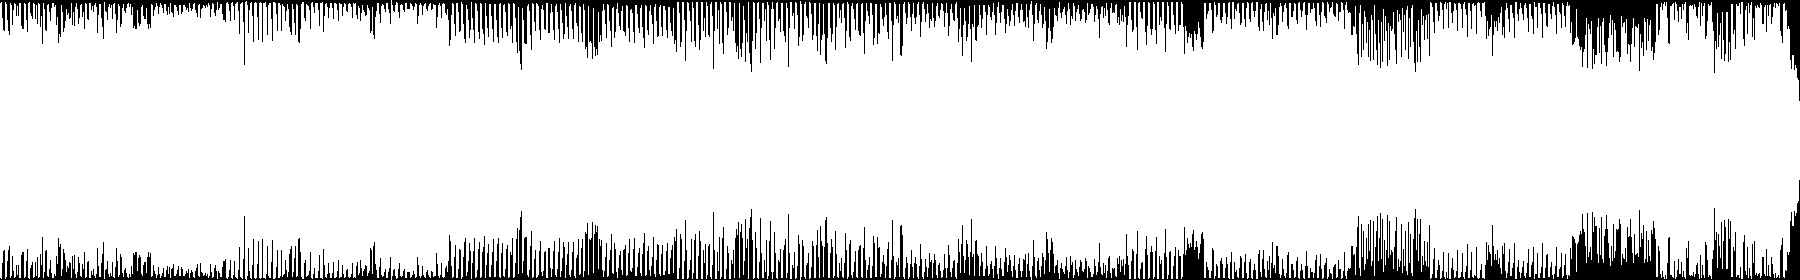 BERLIN TECHNO audio waveform